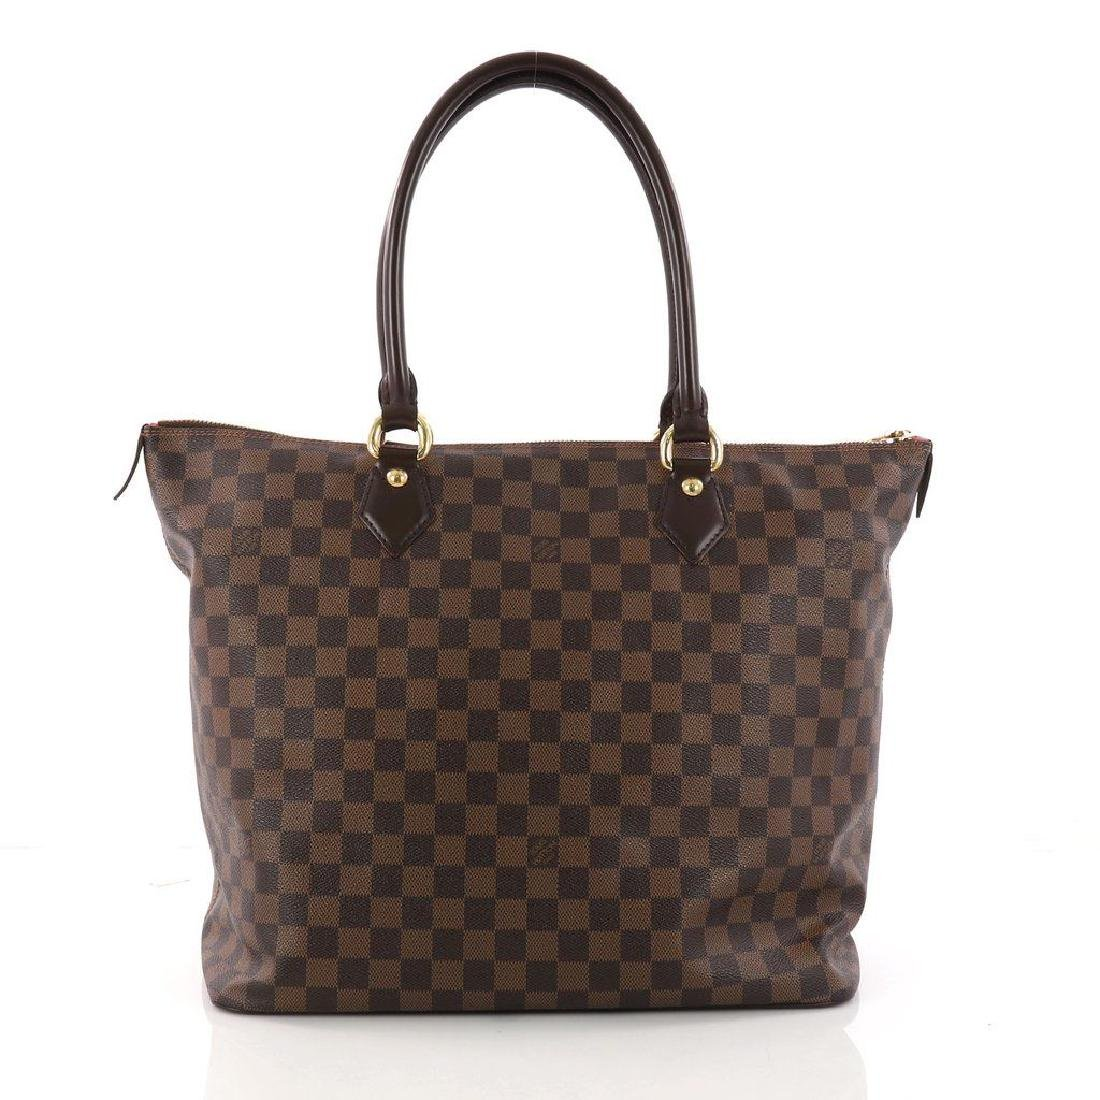 Louis Vuitton Damier Ebene Saleya GM Tote Shoulder Bag - 3